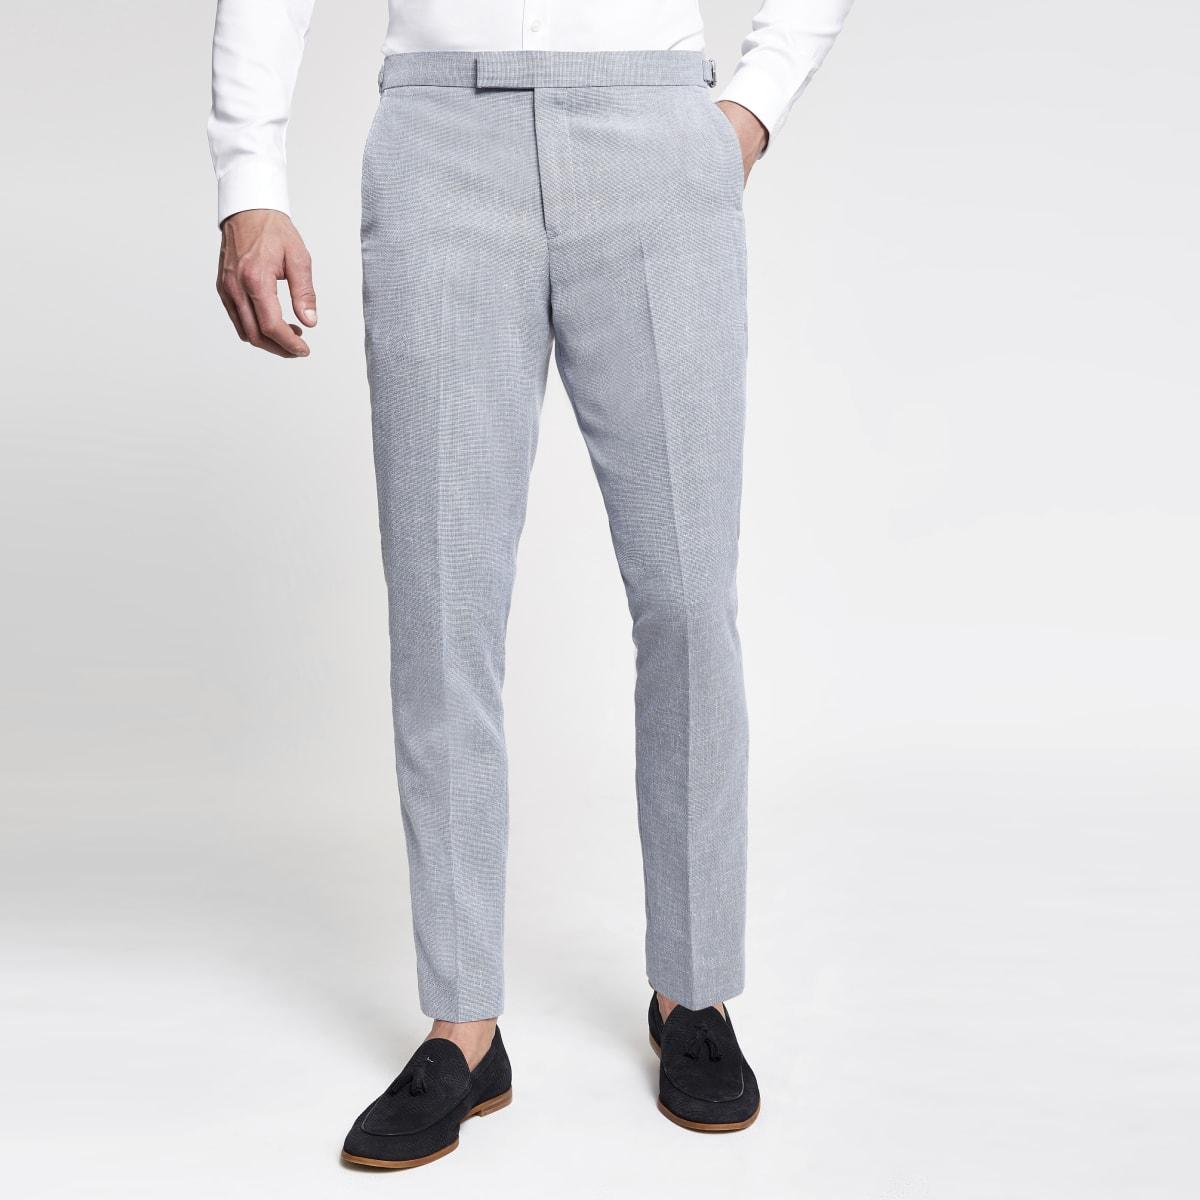 Light blue skinny suit trousers